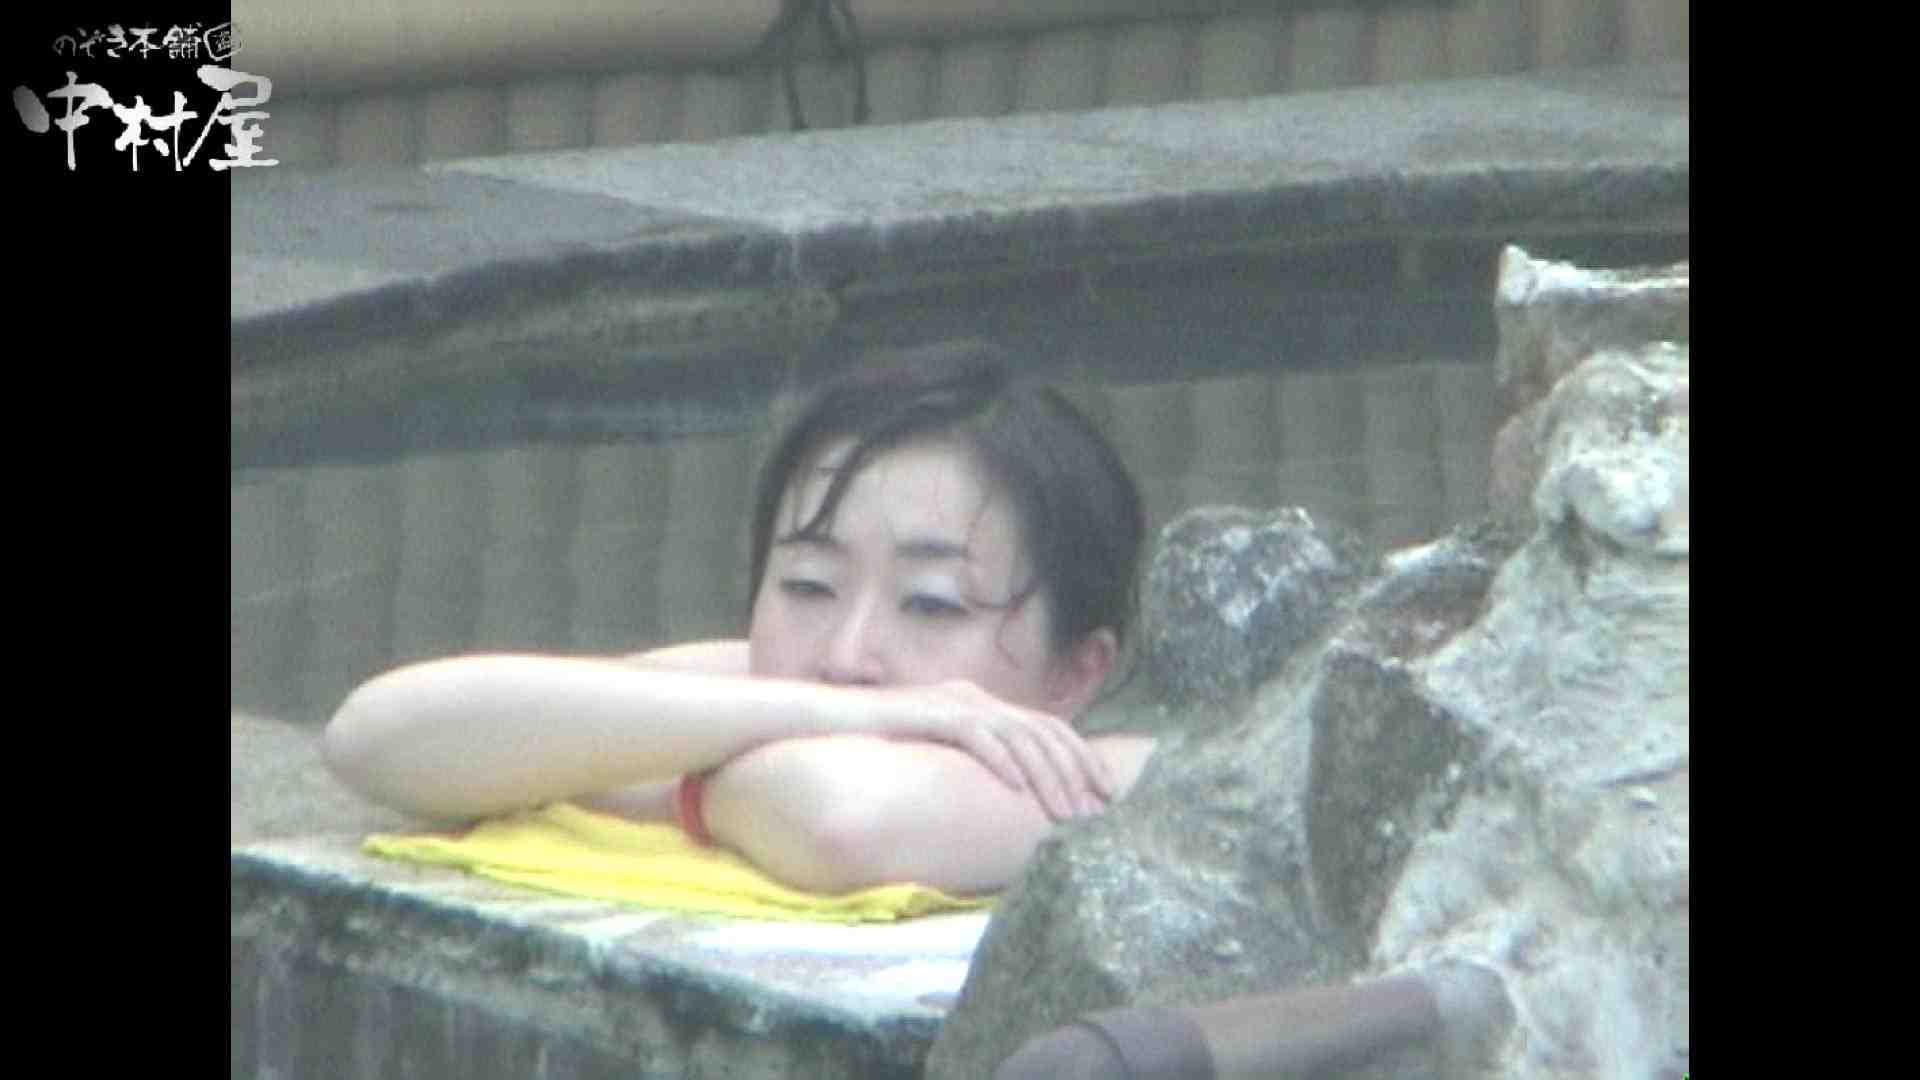 Aquaな露天風呂Vol.957 盗撮シリーズ | 露天風呂編  110PIX 89